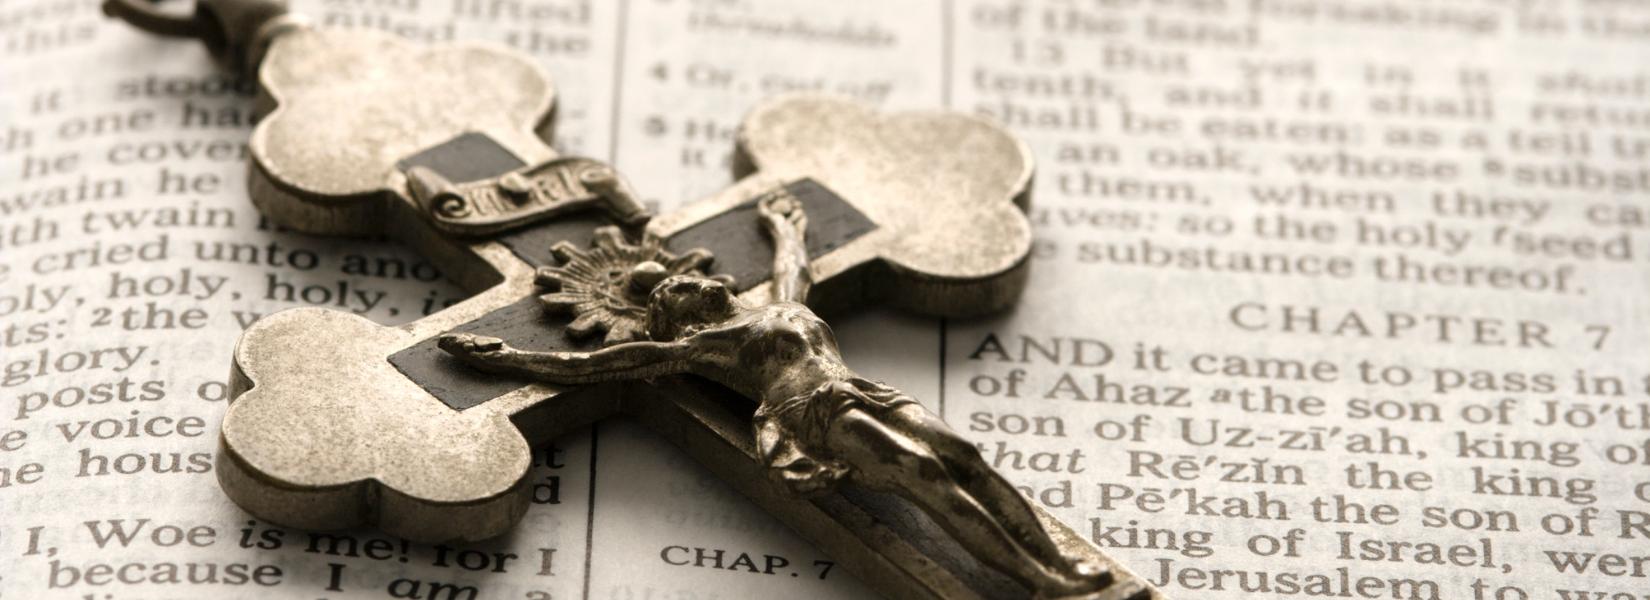 Cross on top of open bible